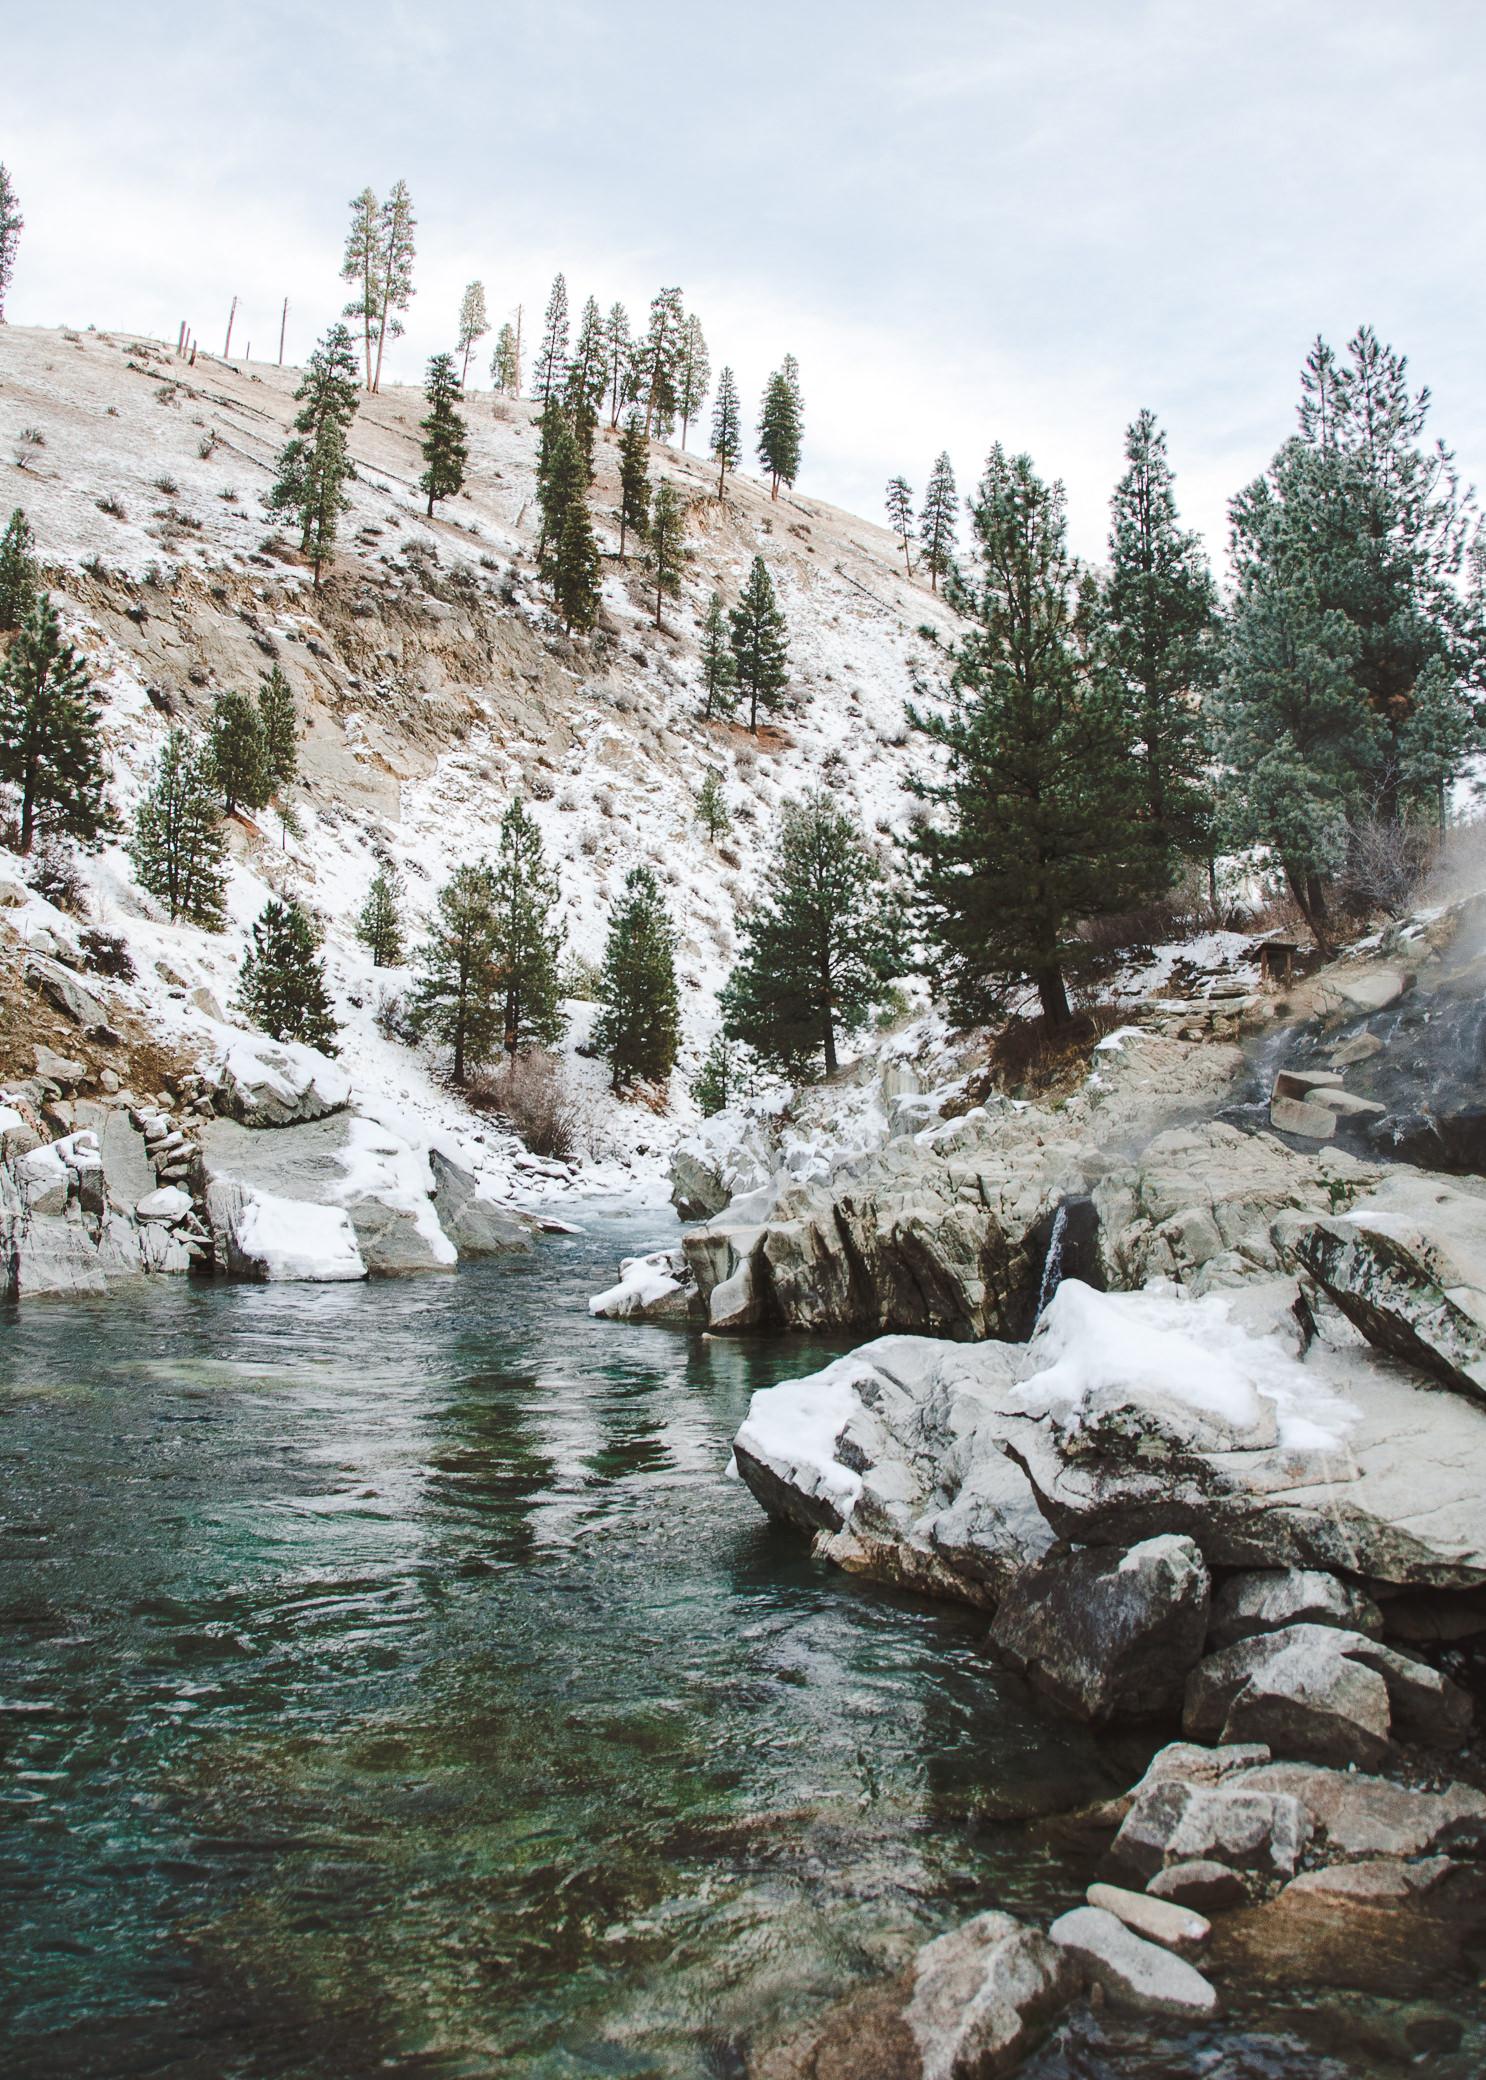 Kirkham Hot Springs - Lowman, Idaho